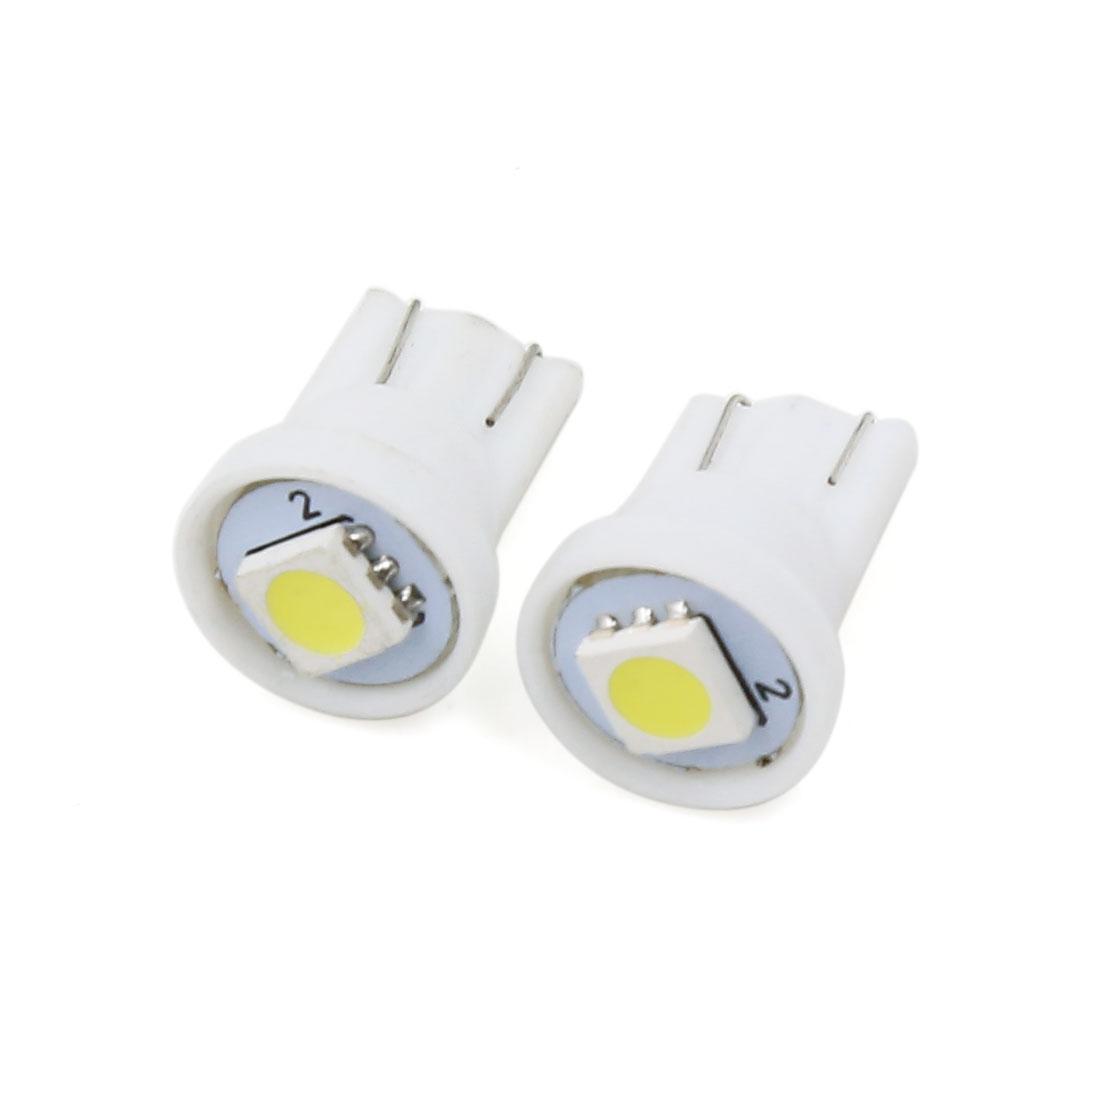 White T10 1-LED 5050 SMD Auto Corner Signal Light Lamp Bulbs 2 Pcs Interior